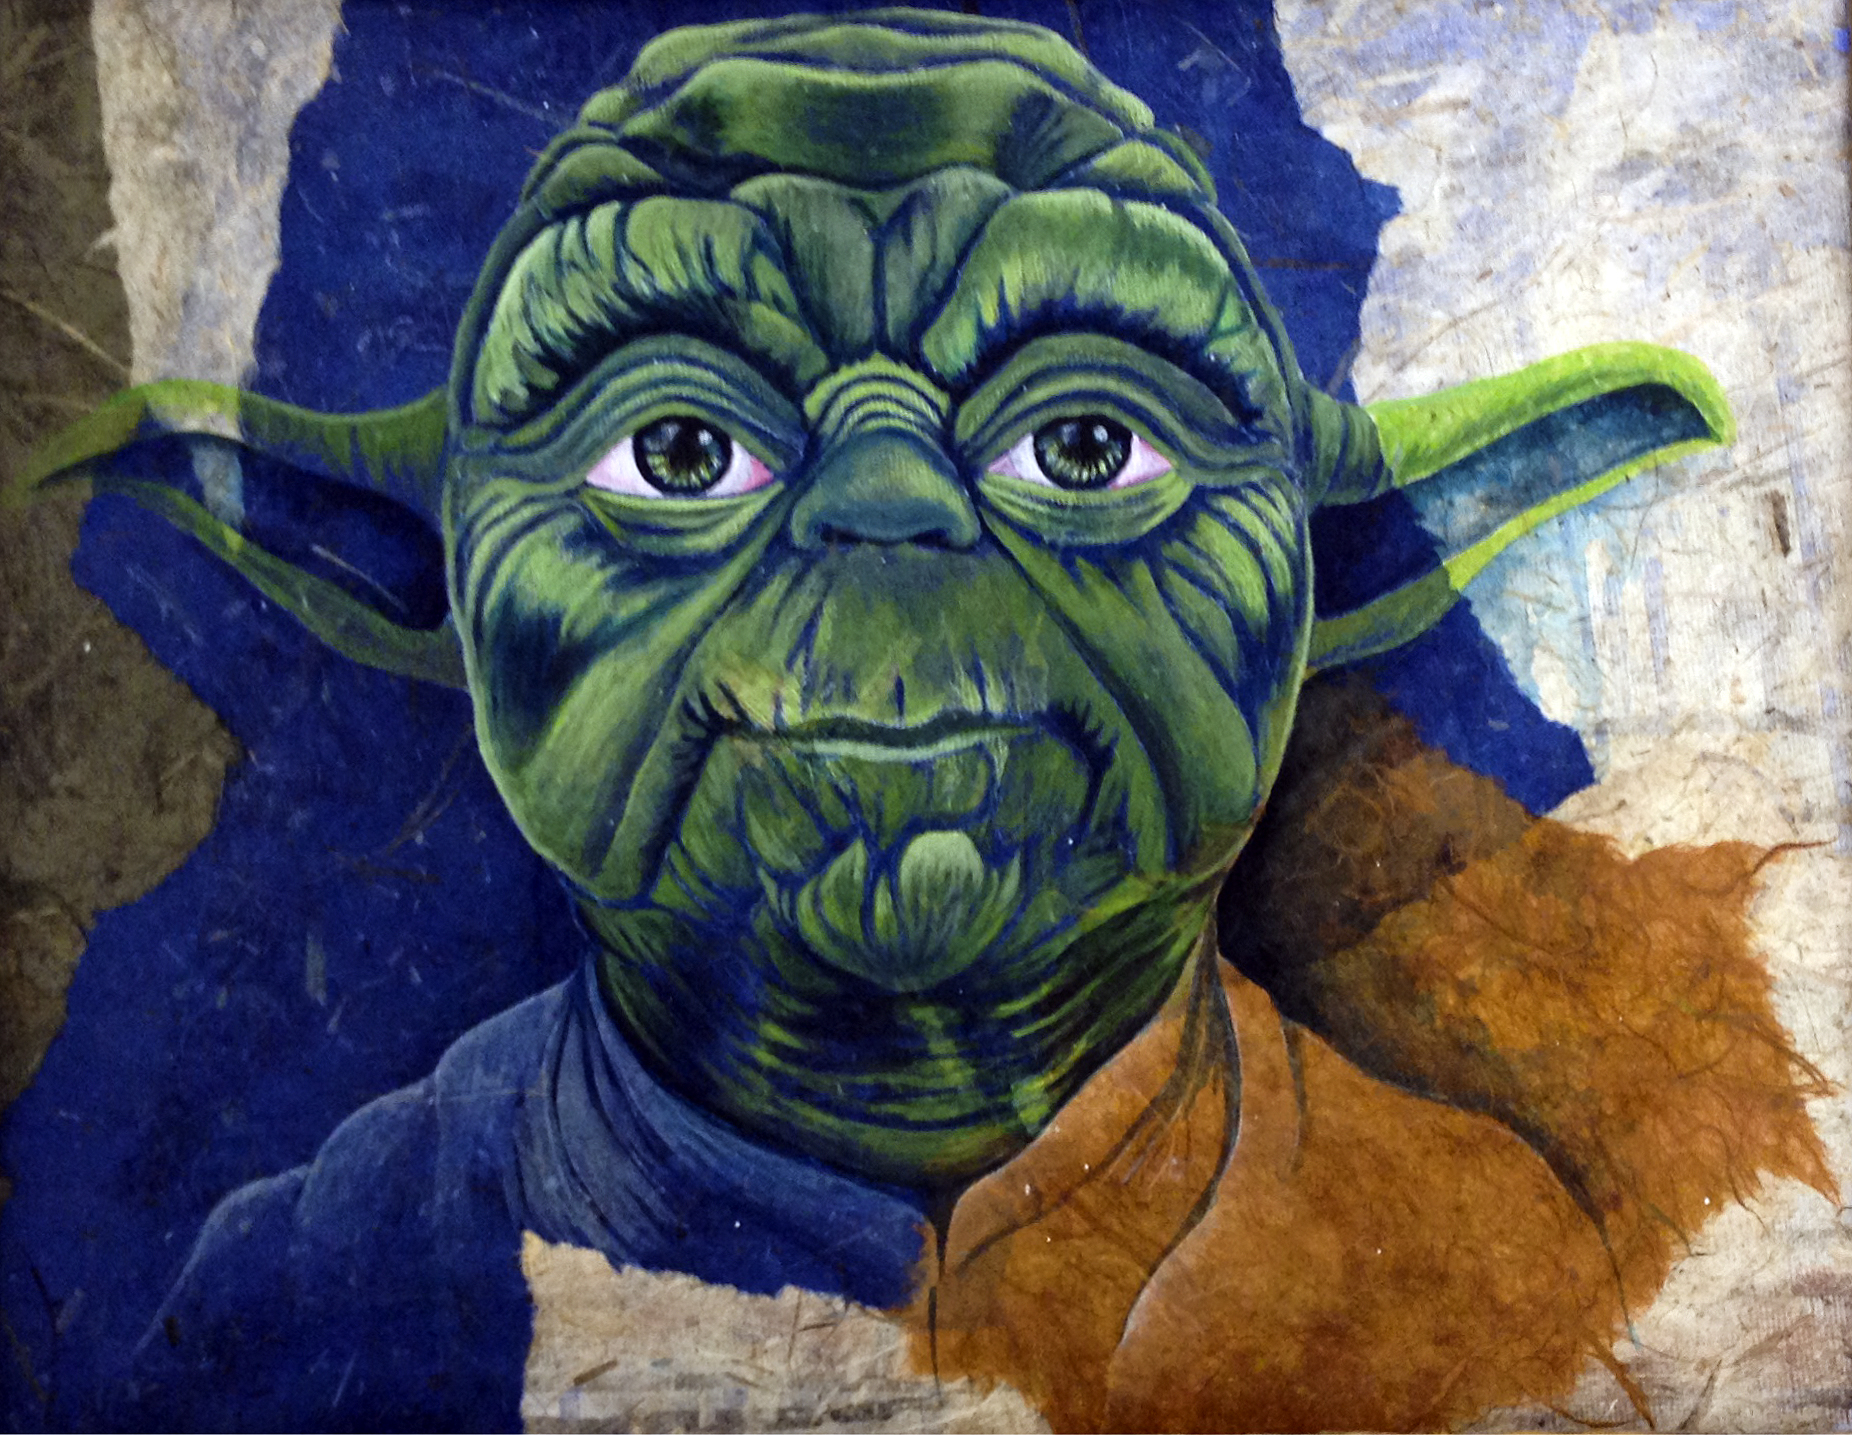 Sir Yoda